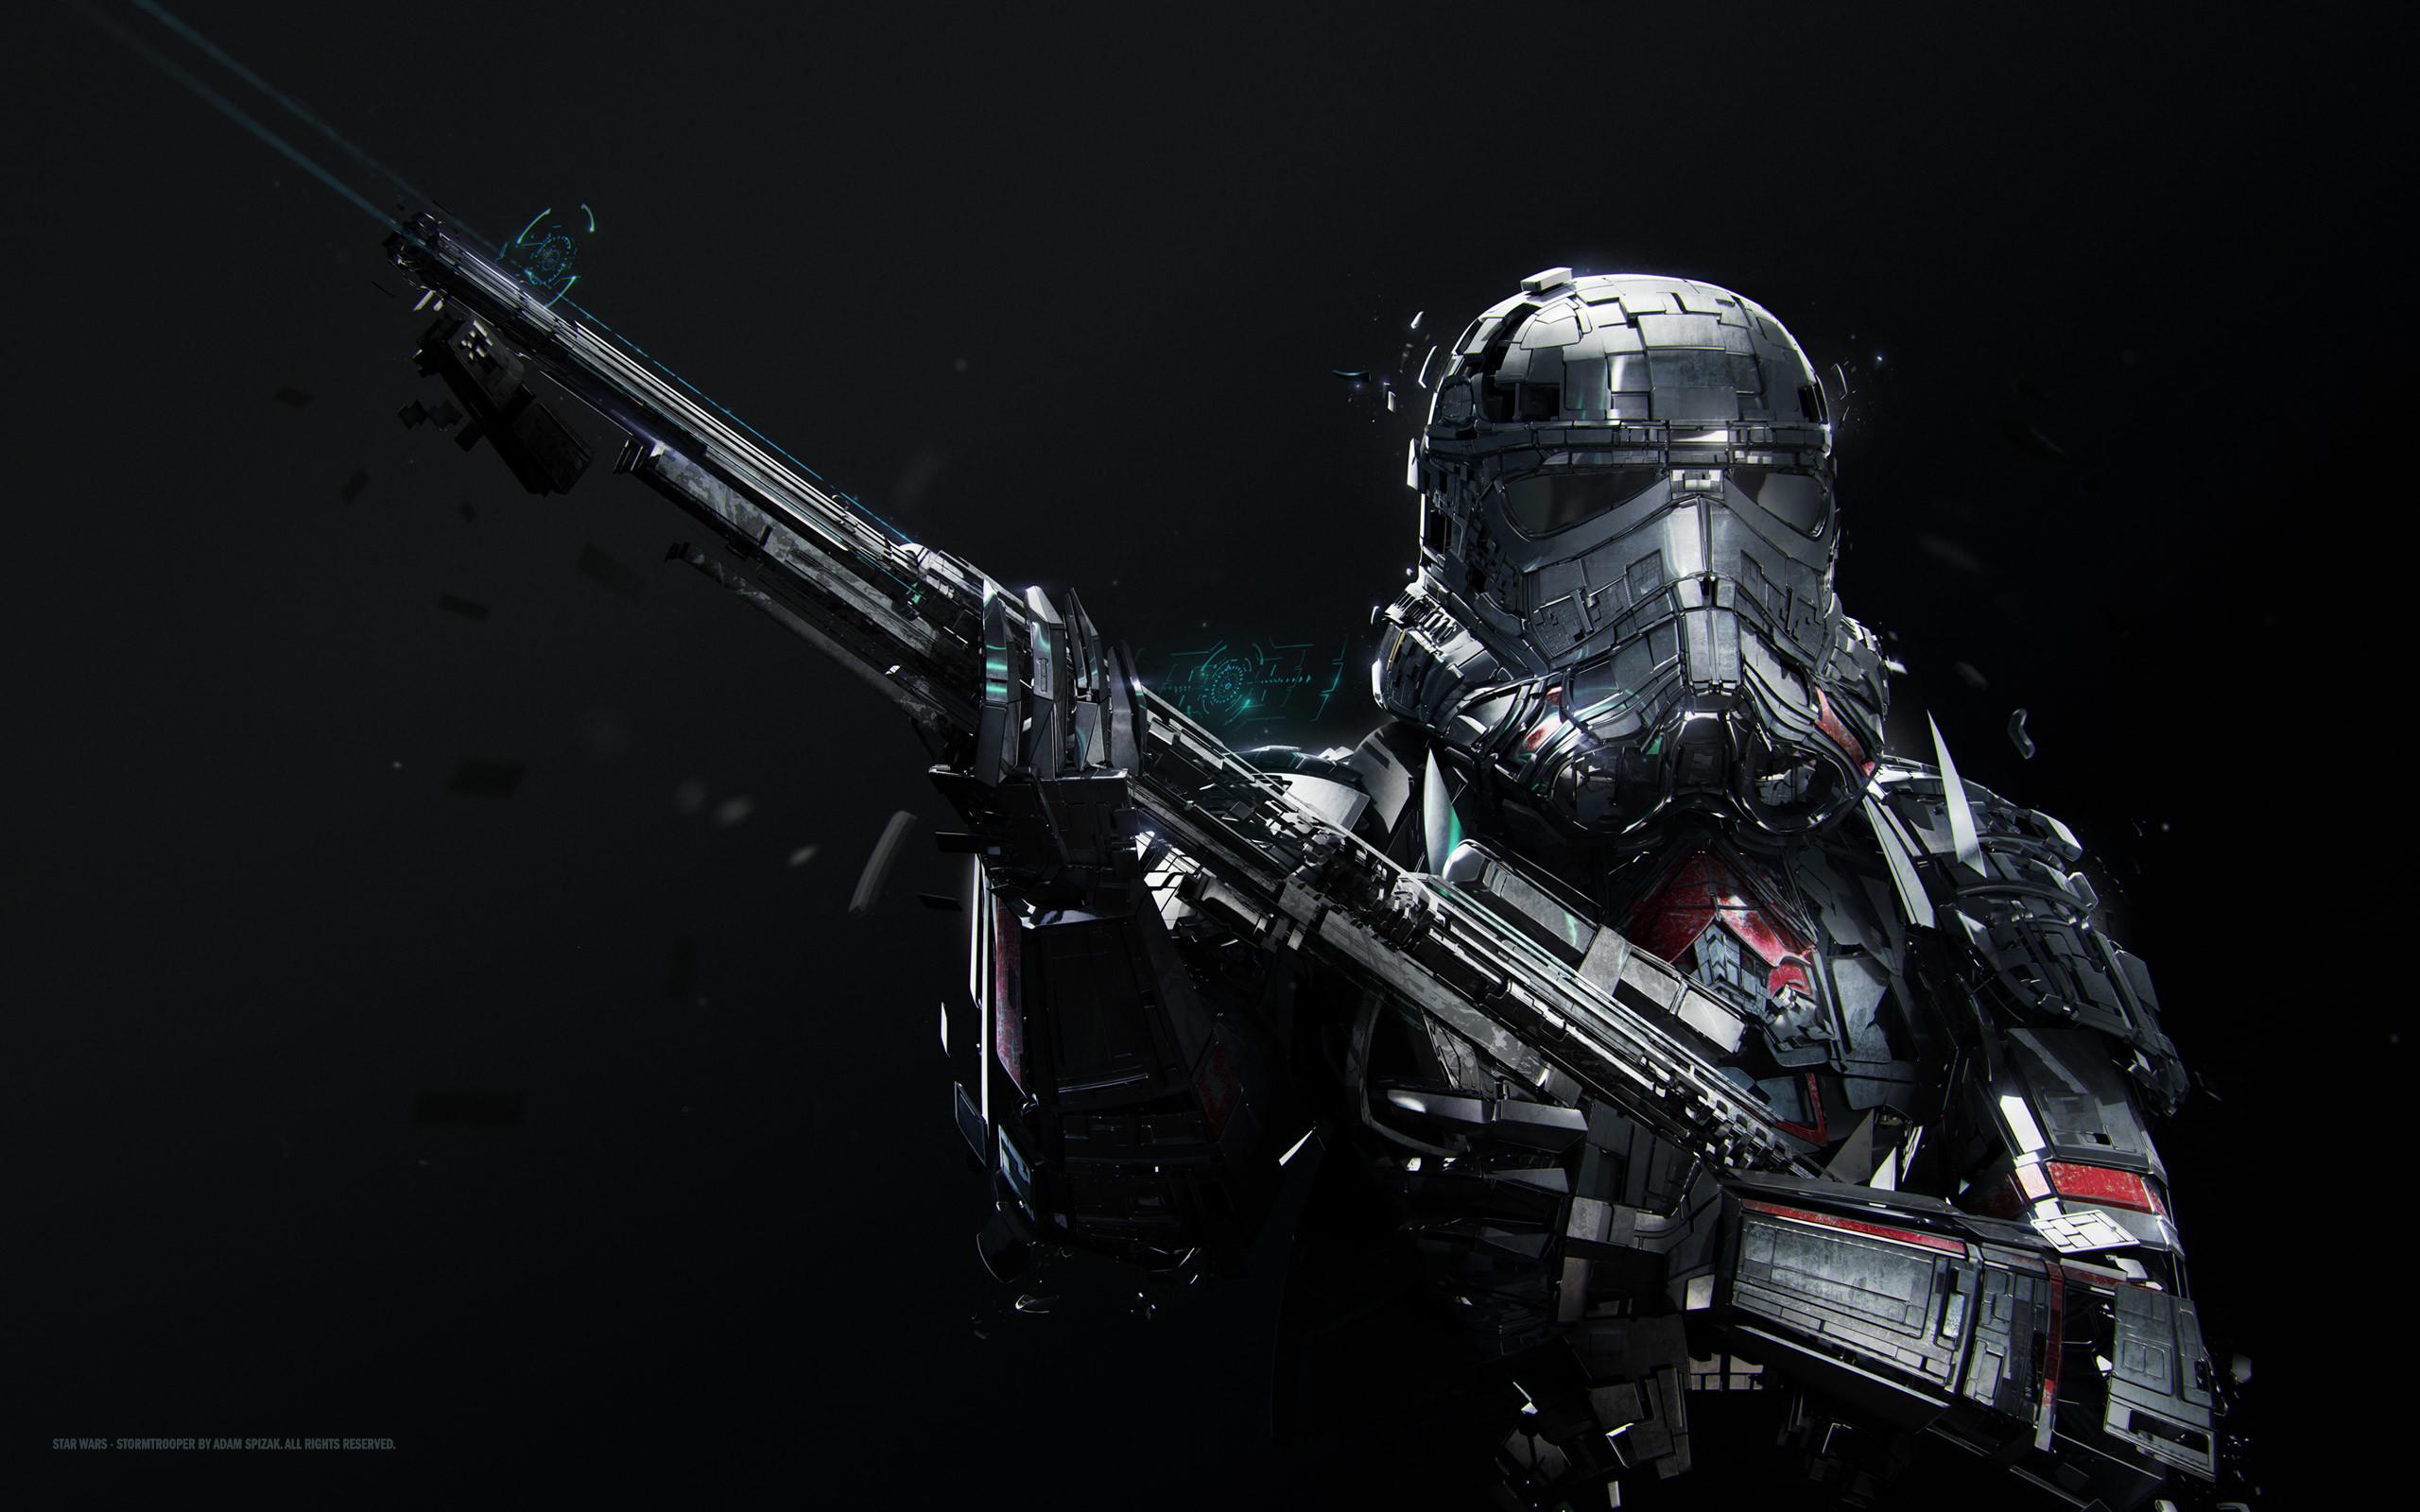 Star Wars Stormtrooper 2048×1152 Resolution